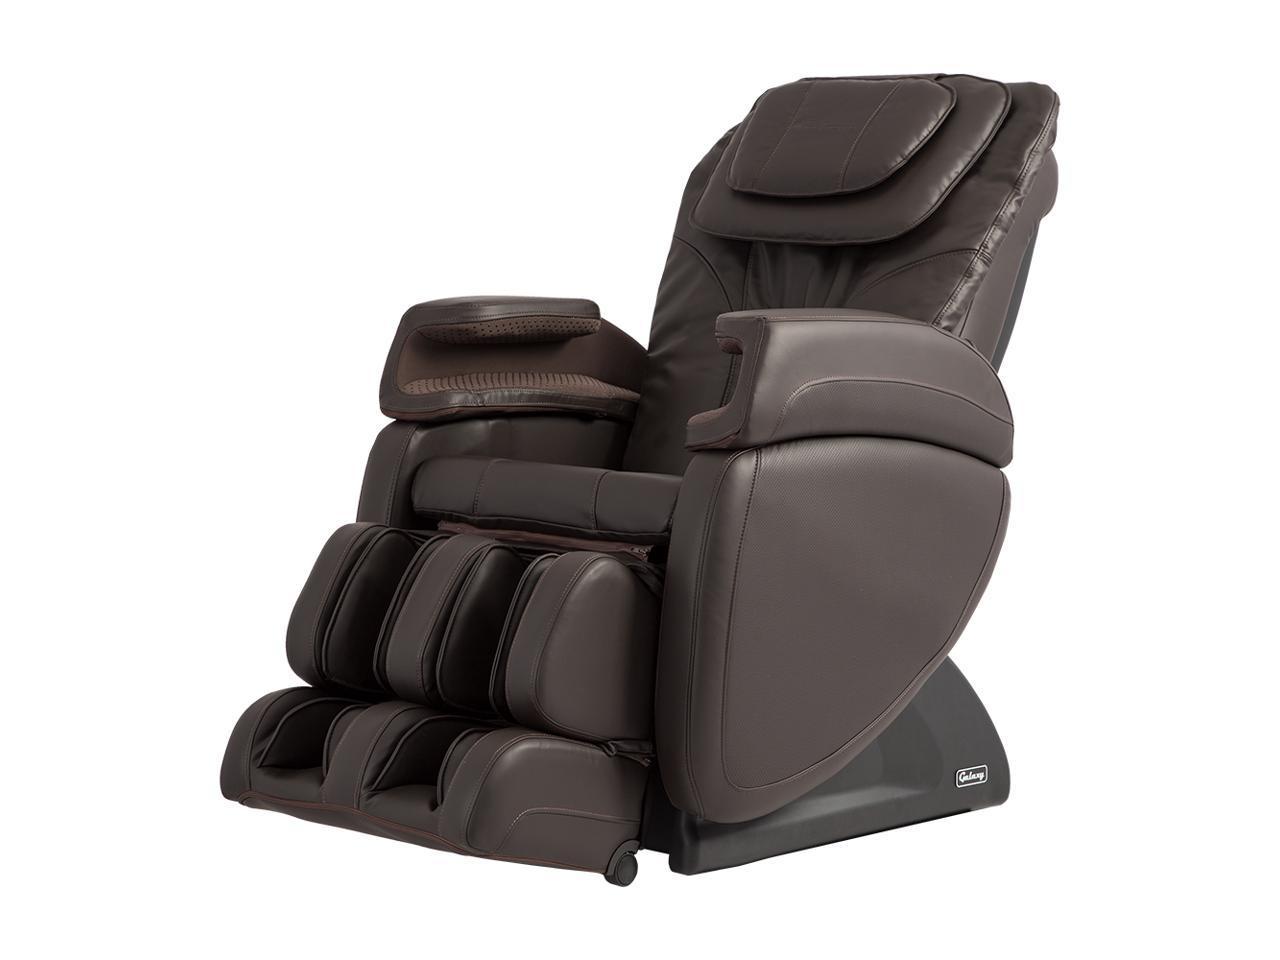 Galaxy EC563 XL Multifunctional Massage Chair